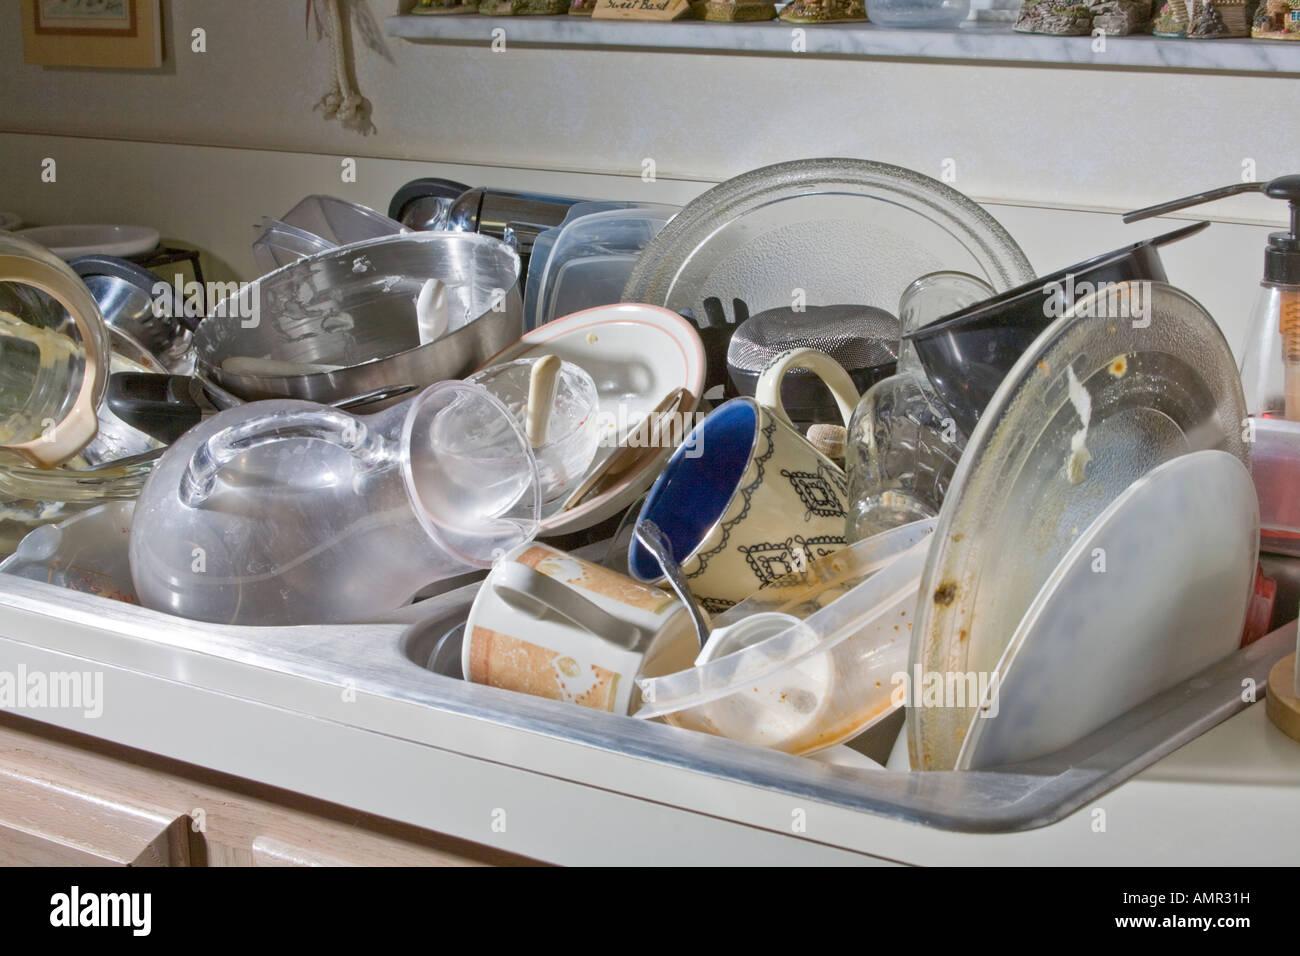 Kitchen Sink Washing Up Bowls